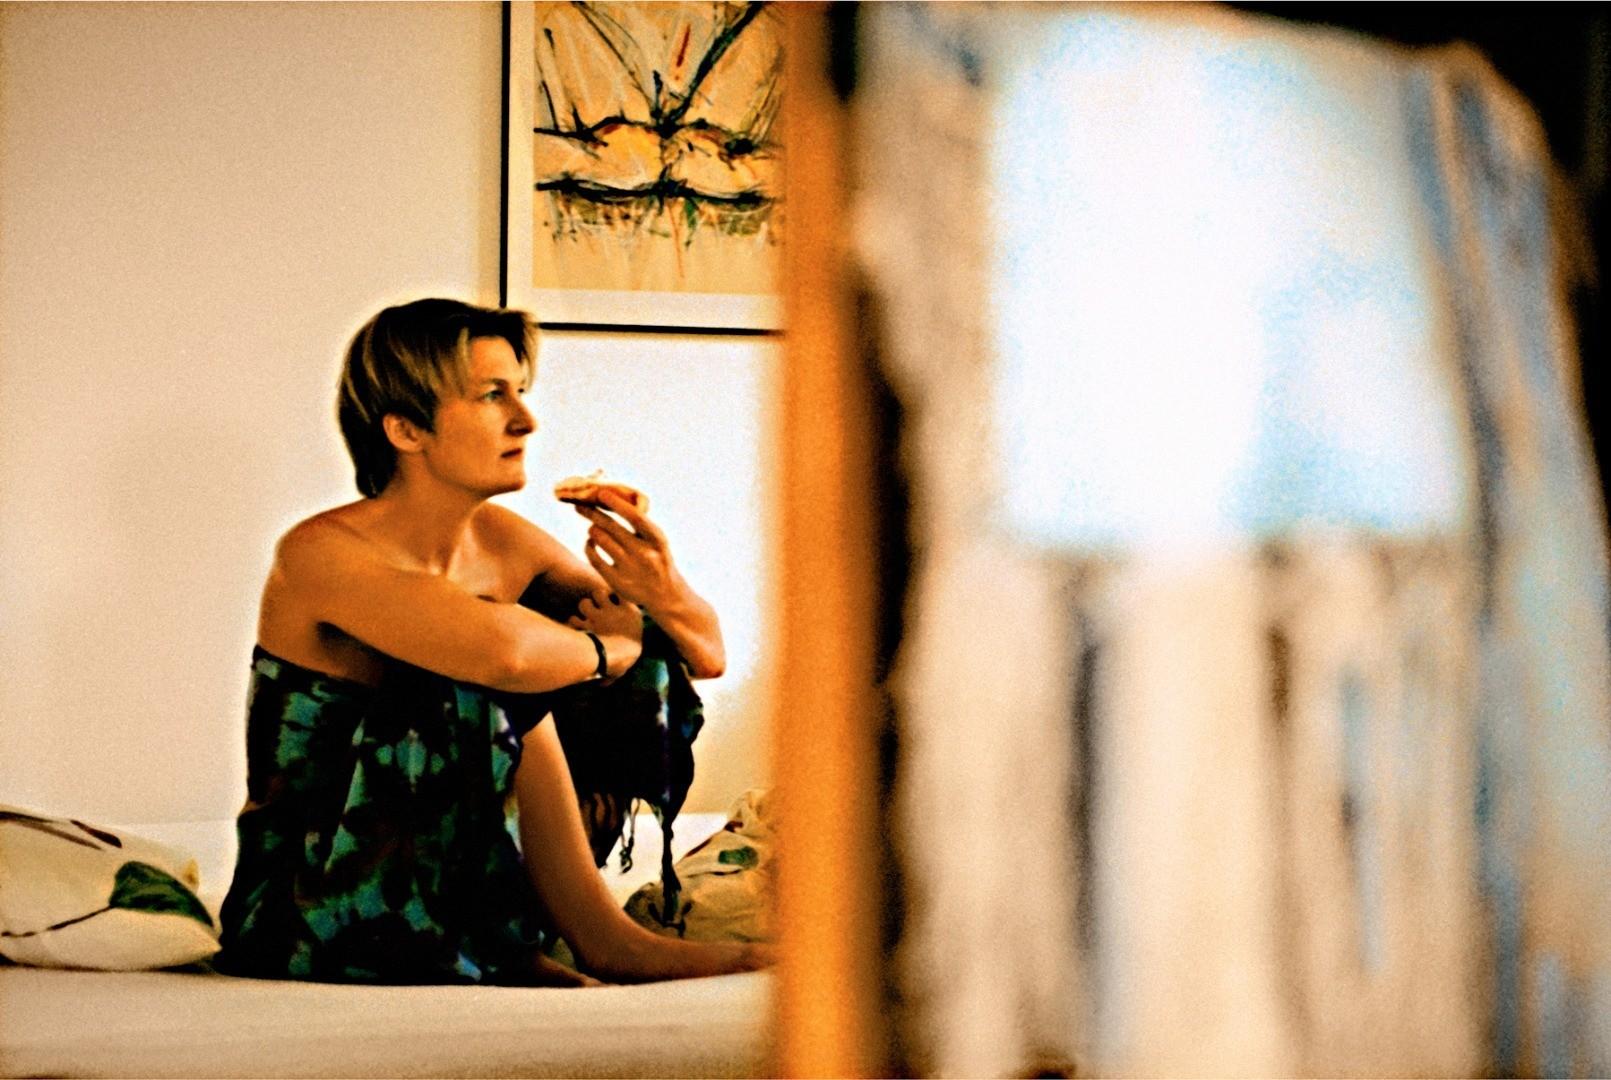 Gabriela © Aleksandra Pawloff